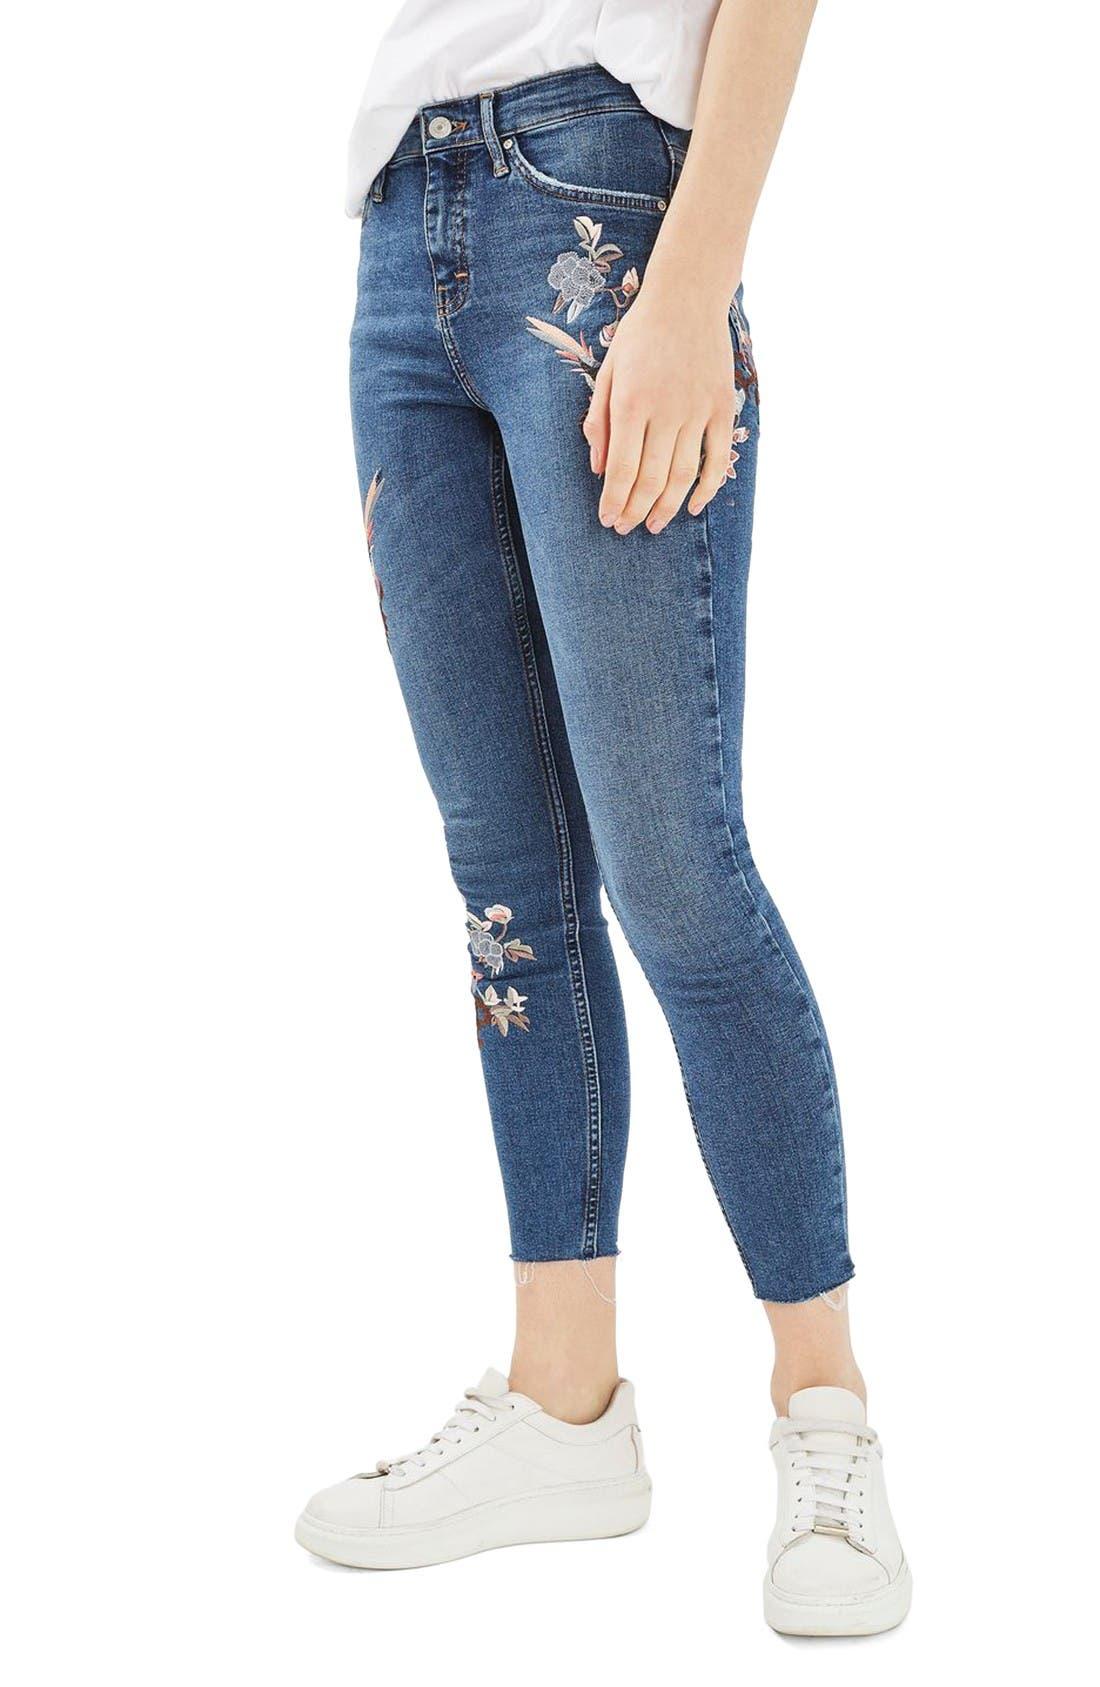 Moto Jamie Embroidered Skinny Jeans,                         Main,                         color, Mid Denim